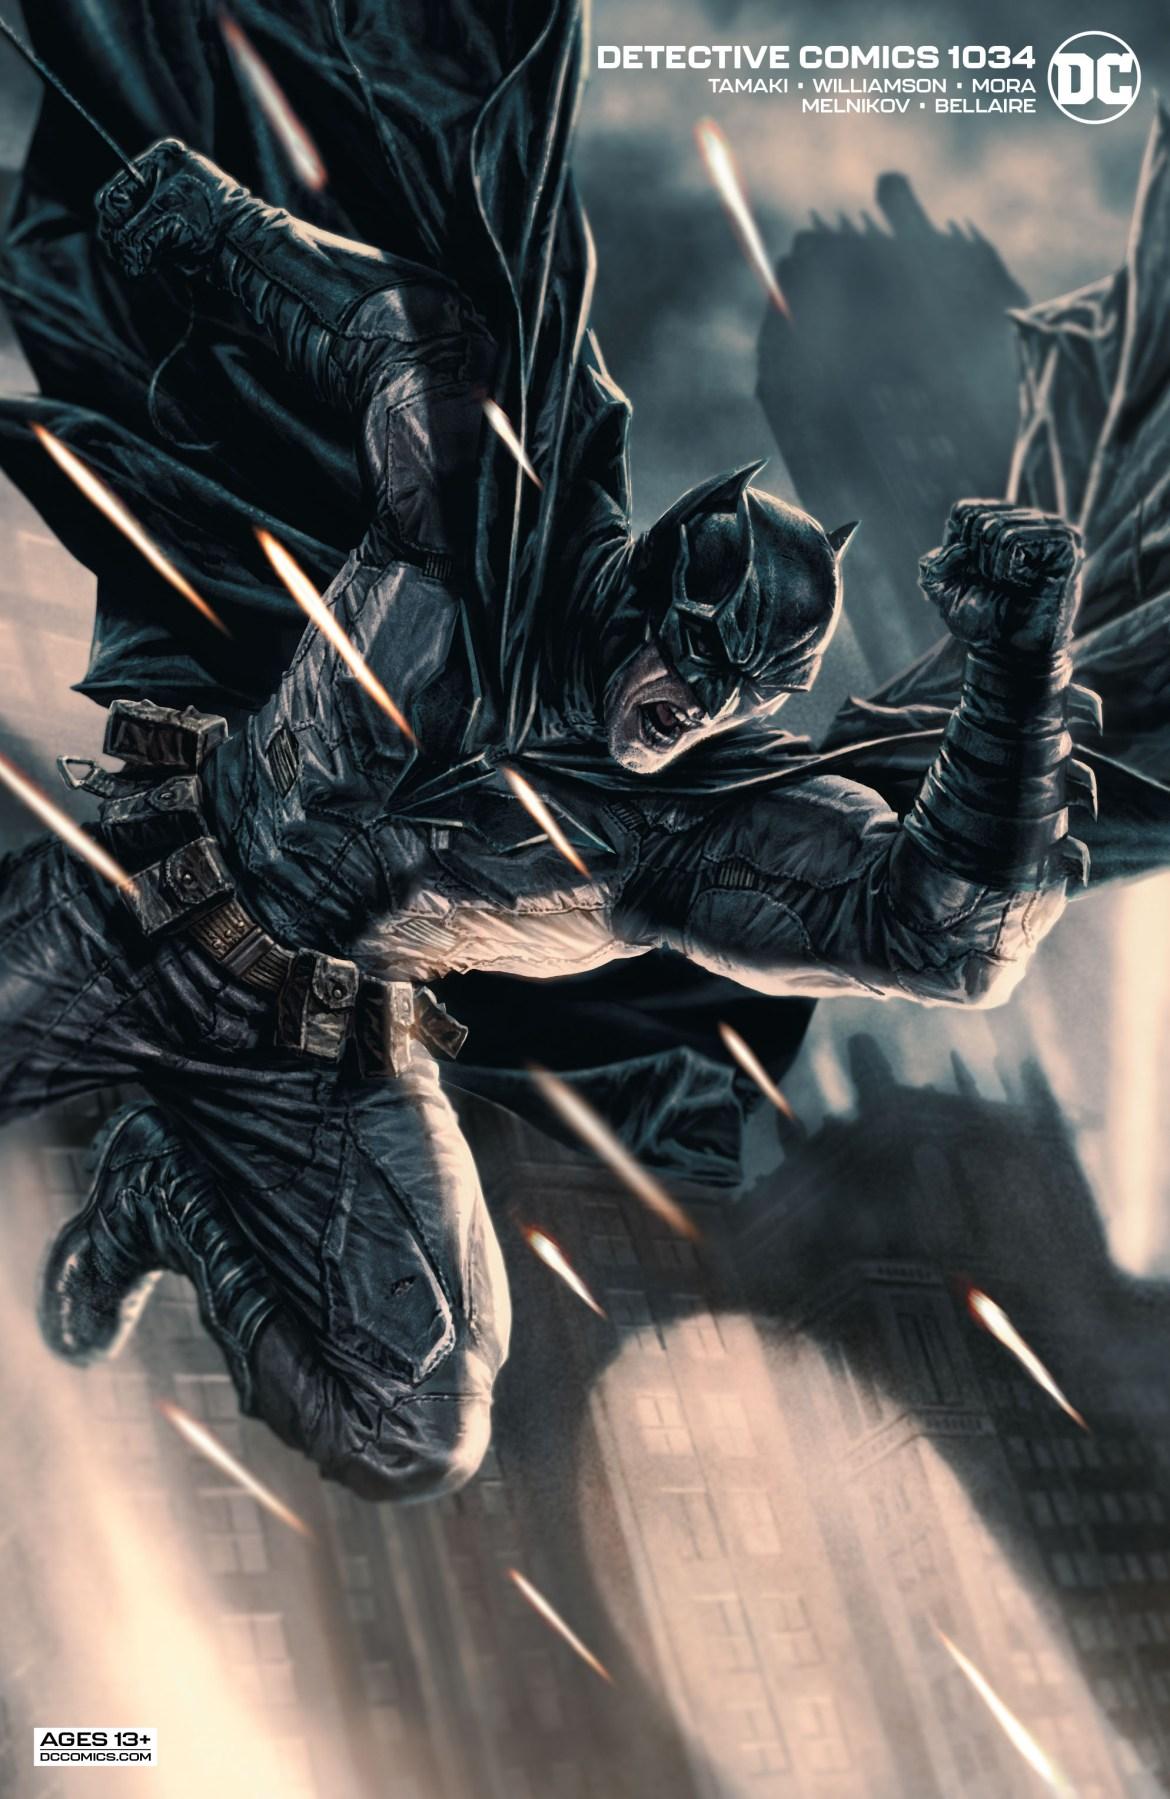 0121DC031 ComicList: DC Comics New Releases for 03/24/2021